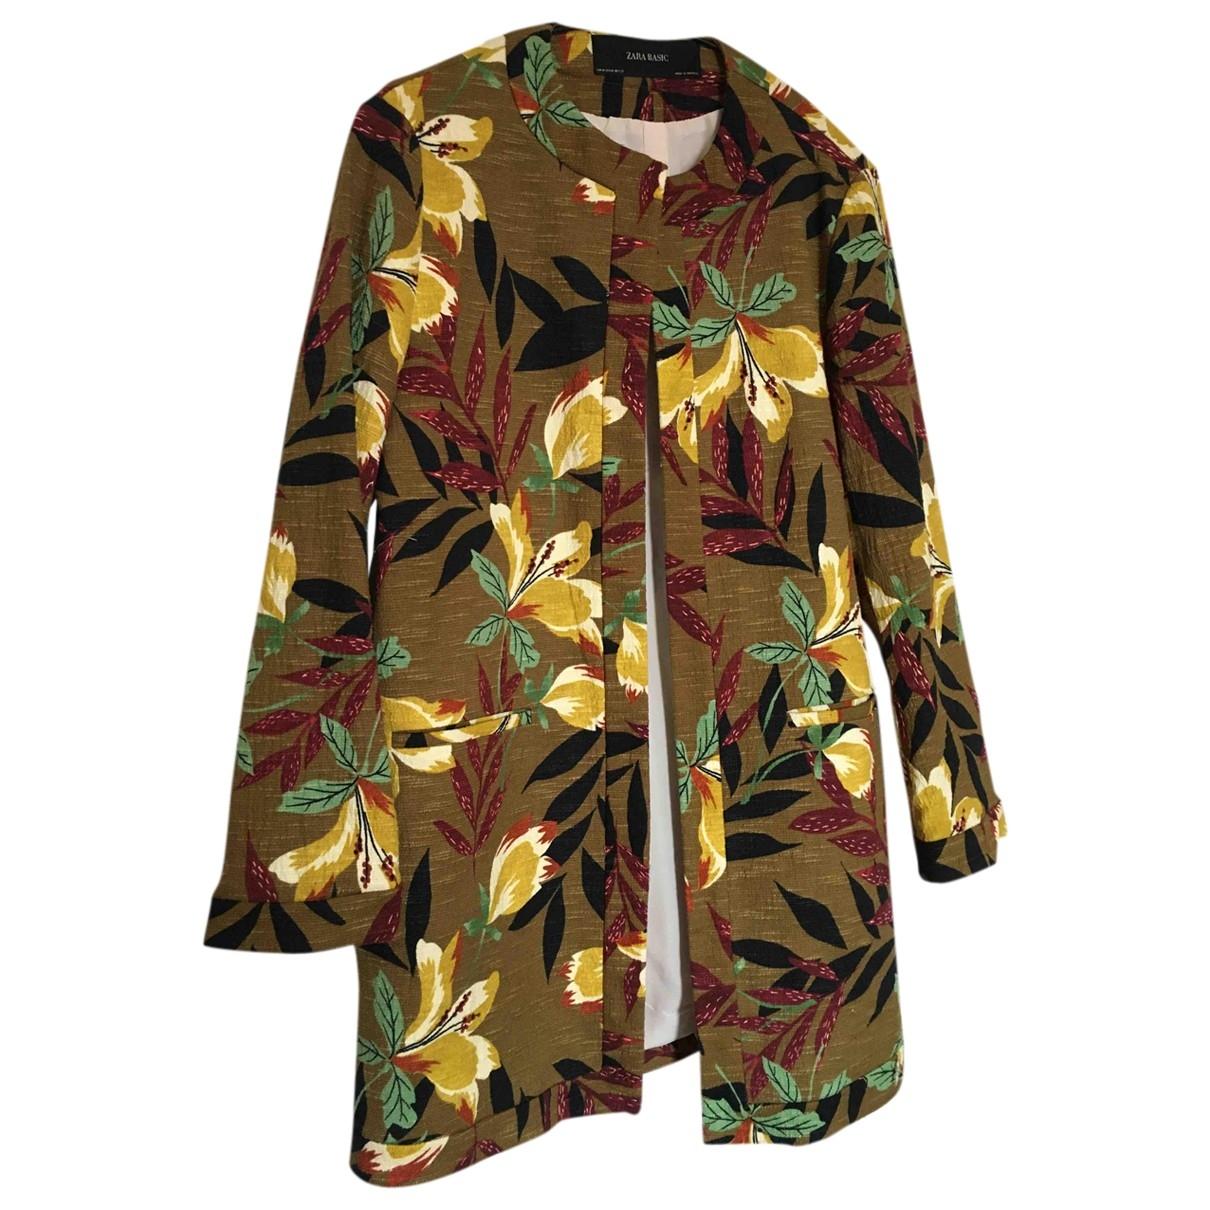 Zara \N Multicolour jacket for Women M International